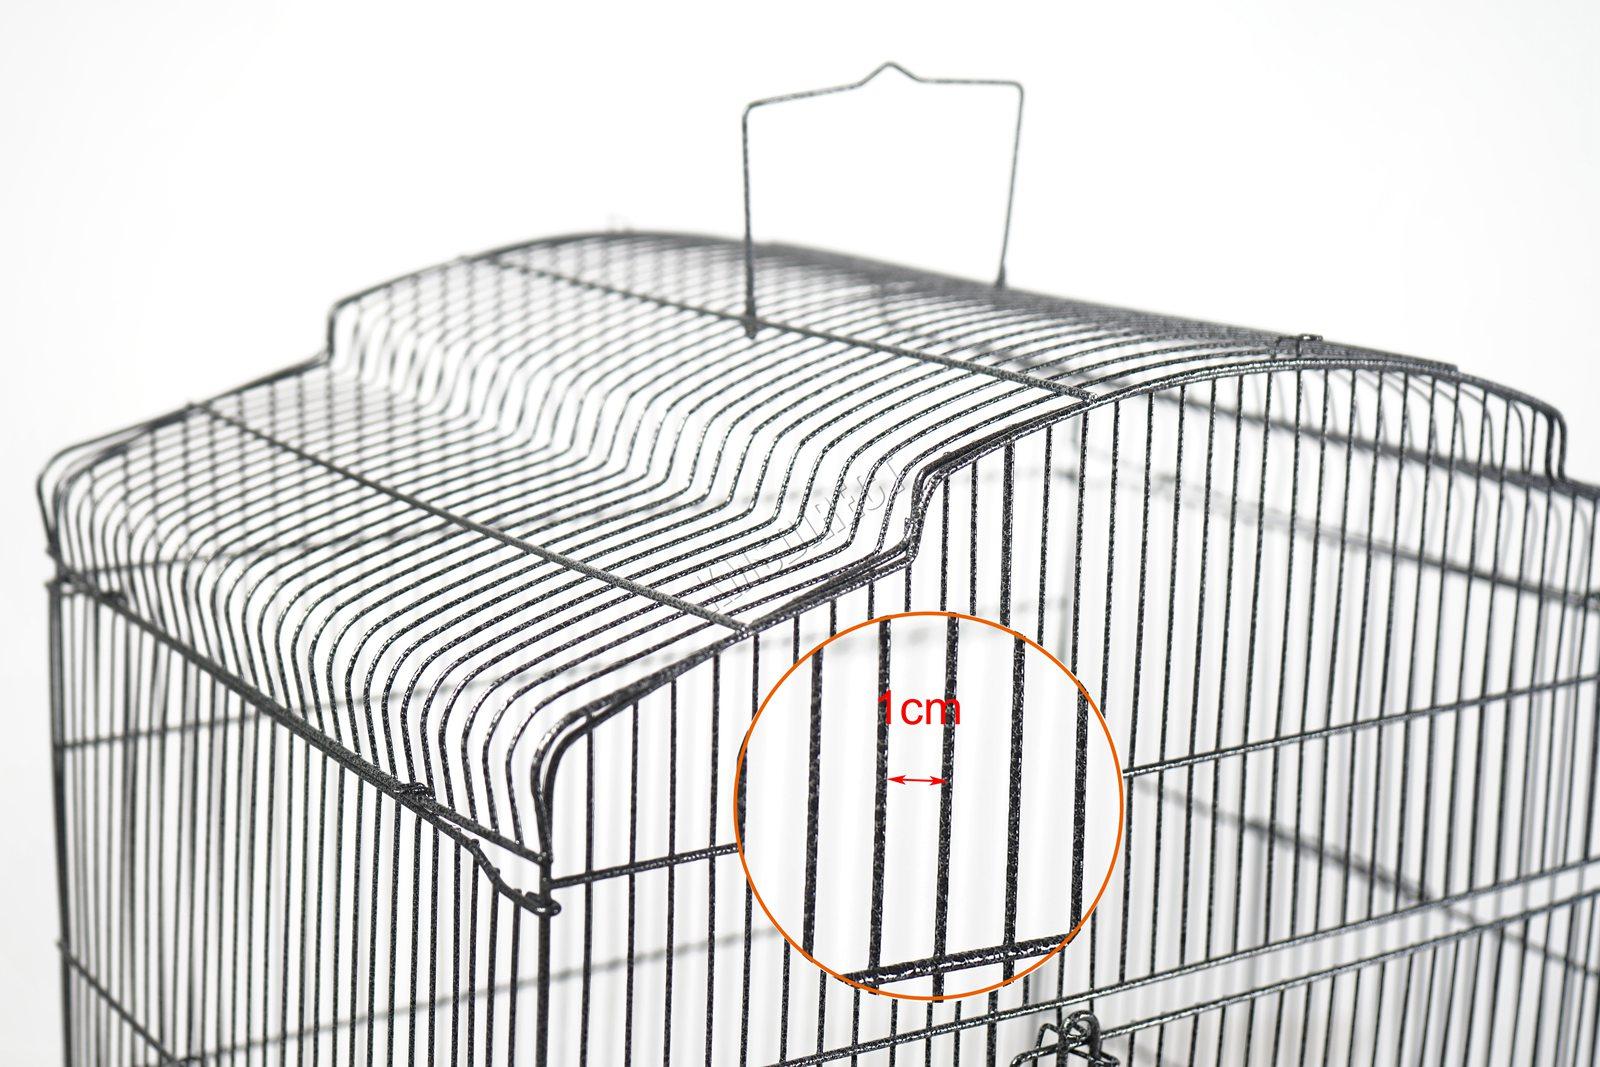 BIRD CAGE METAL MBC 05 HAMMERED SILVER KMSWM08 - Foxhunter Grande Metal Jaula con Soporte Pajarera Loro Periquito Canario Cacatua